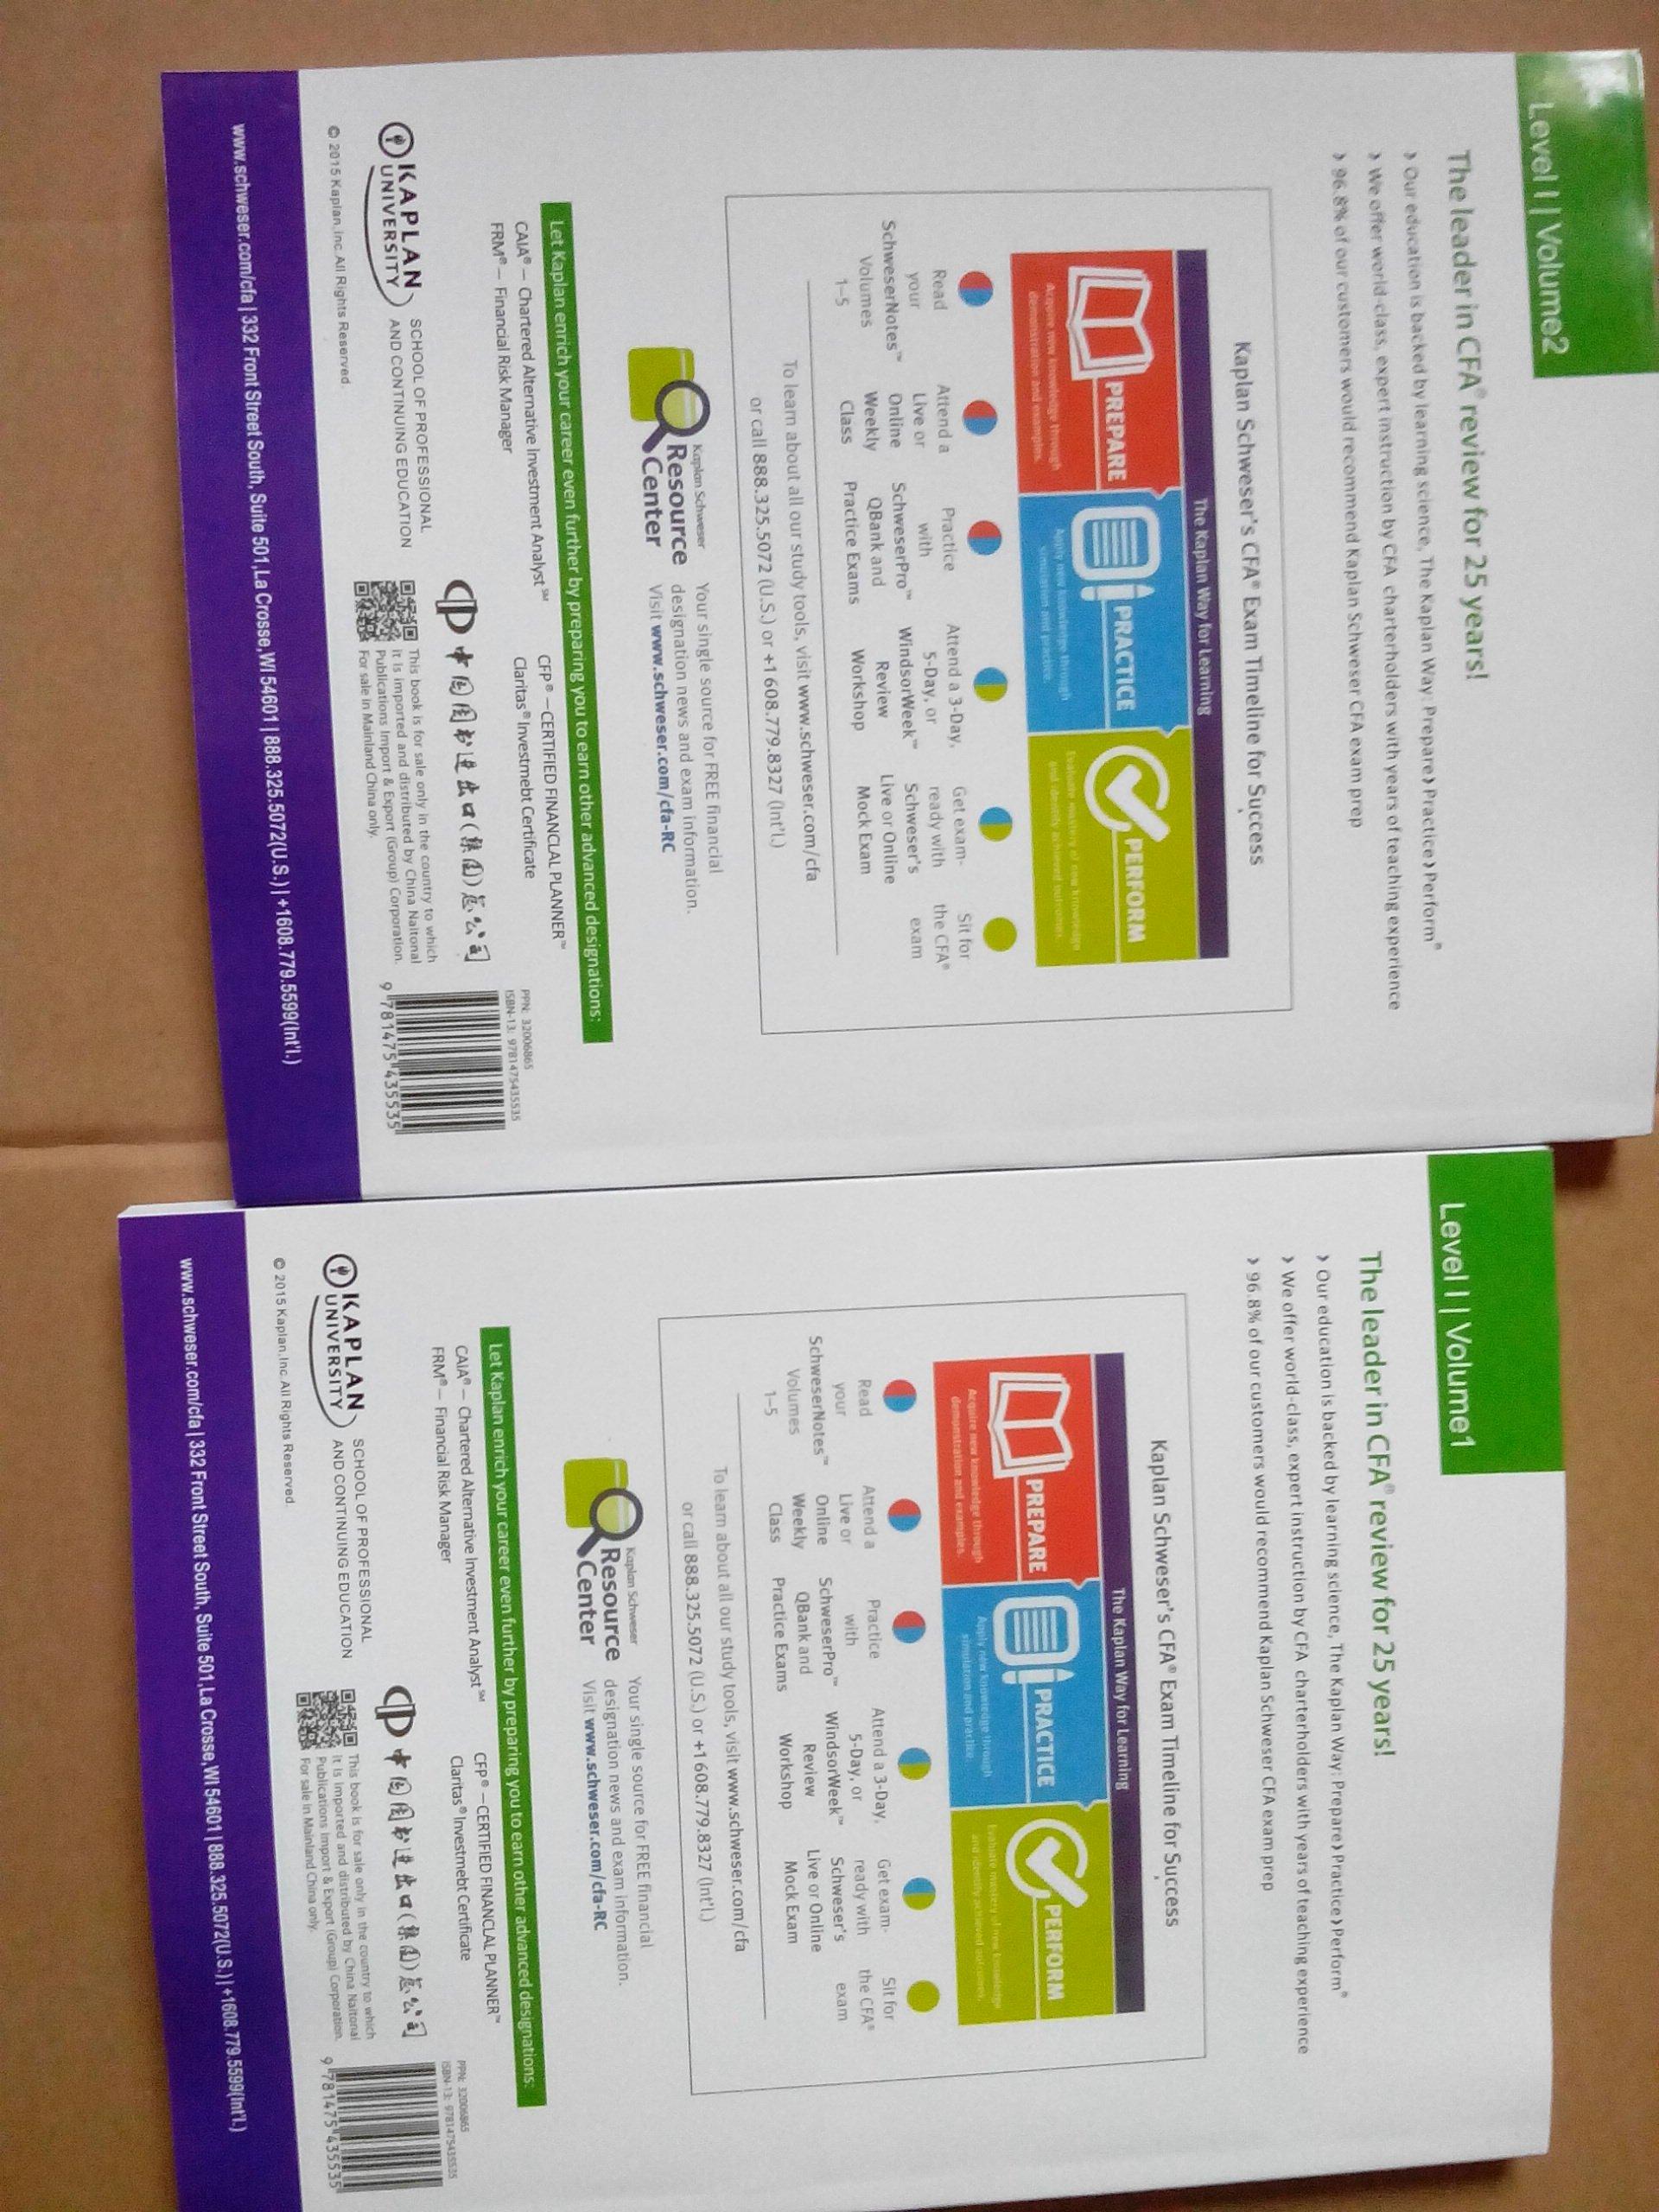 2016 Kaplan Schweser Cfa Level 1 Practice Exams Vol 1 And Vol 2